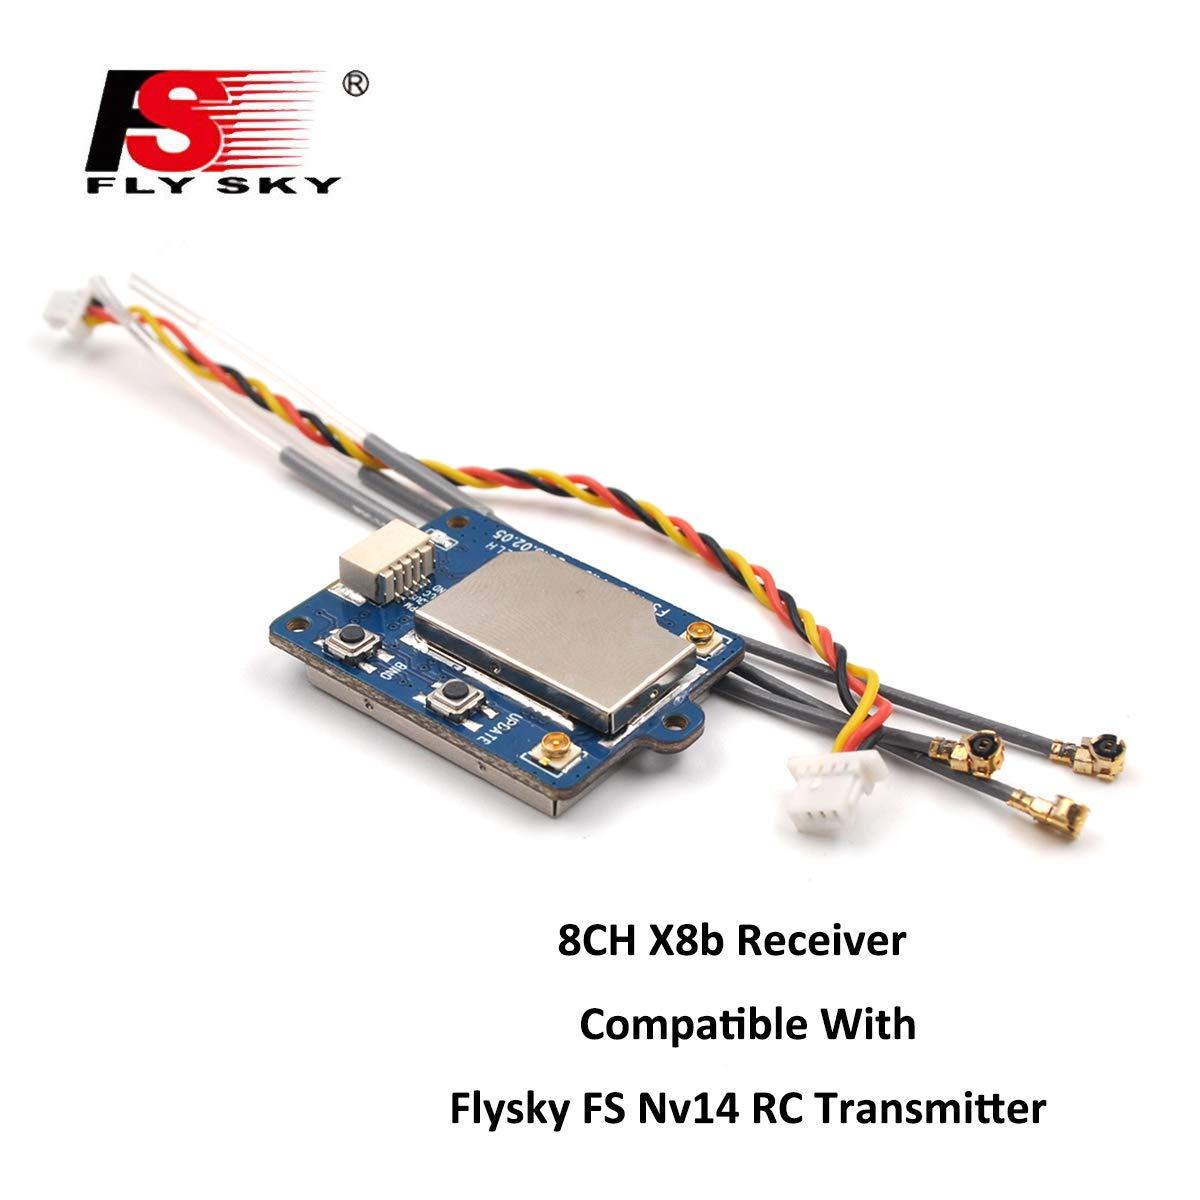 Flysky FS-X8B Receptor, 8CH 2.4G i-Bus / PPM Receptor para FS-Nirvana FS-NV14 FS-i6 FS-i6s FS-i6x FS-i8 FS-i10 Transmiso